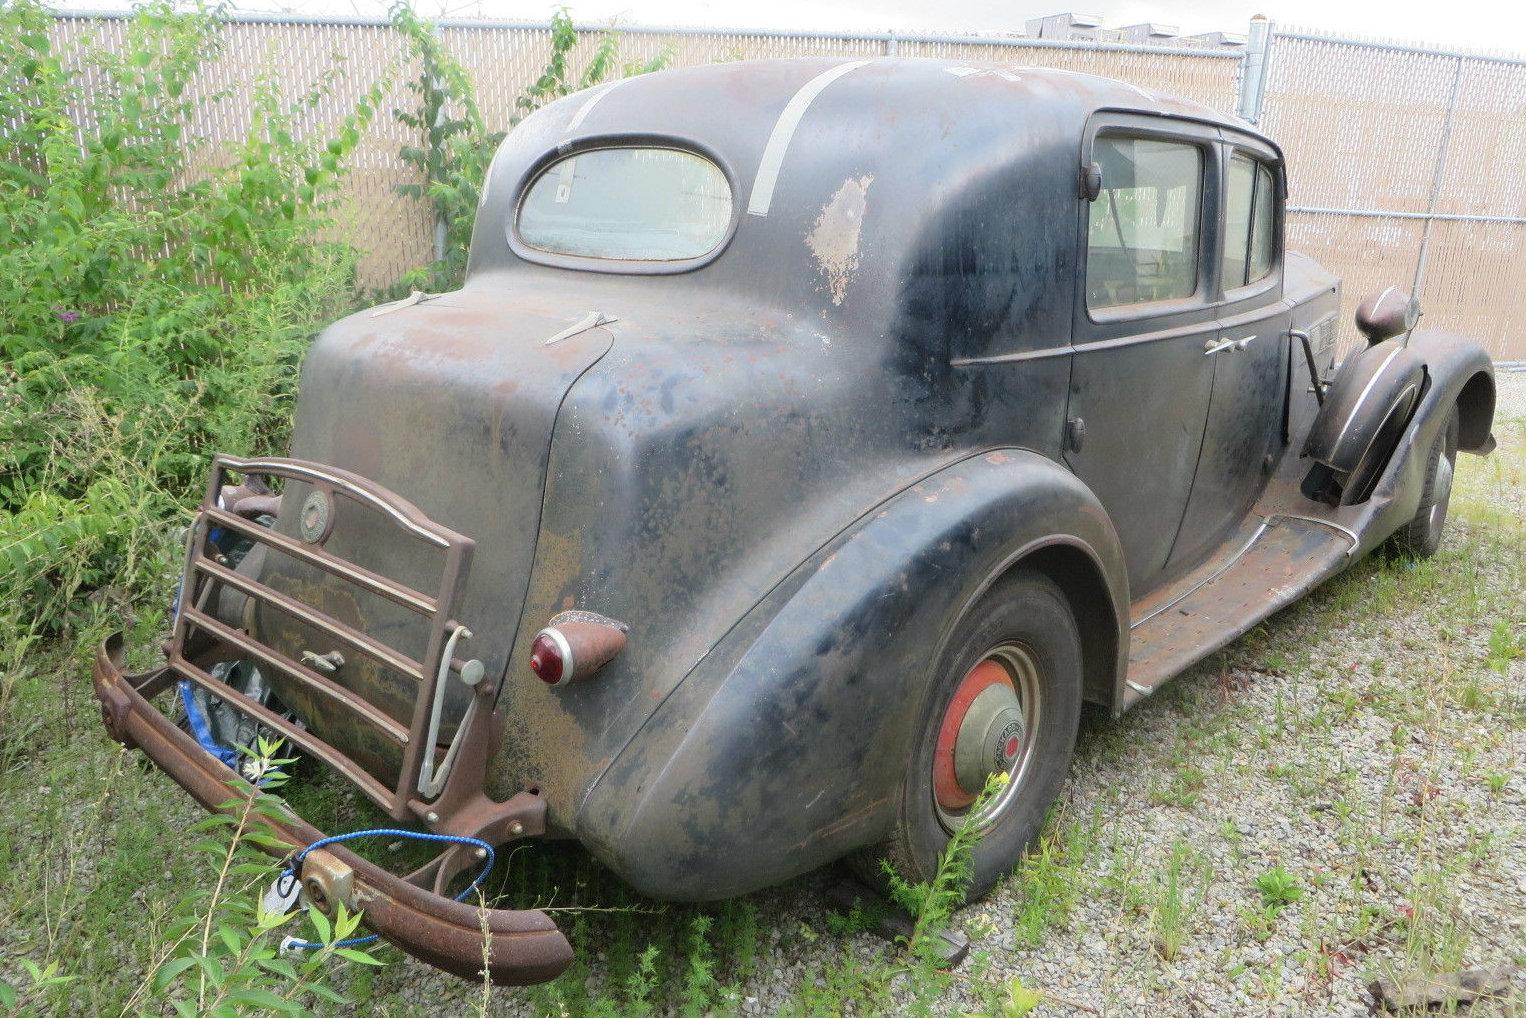 Tarp Find: 1937 Packard Super 8 Club Sedan on